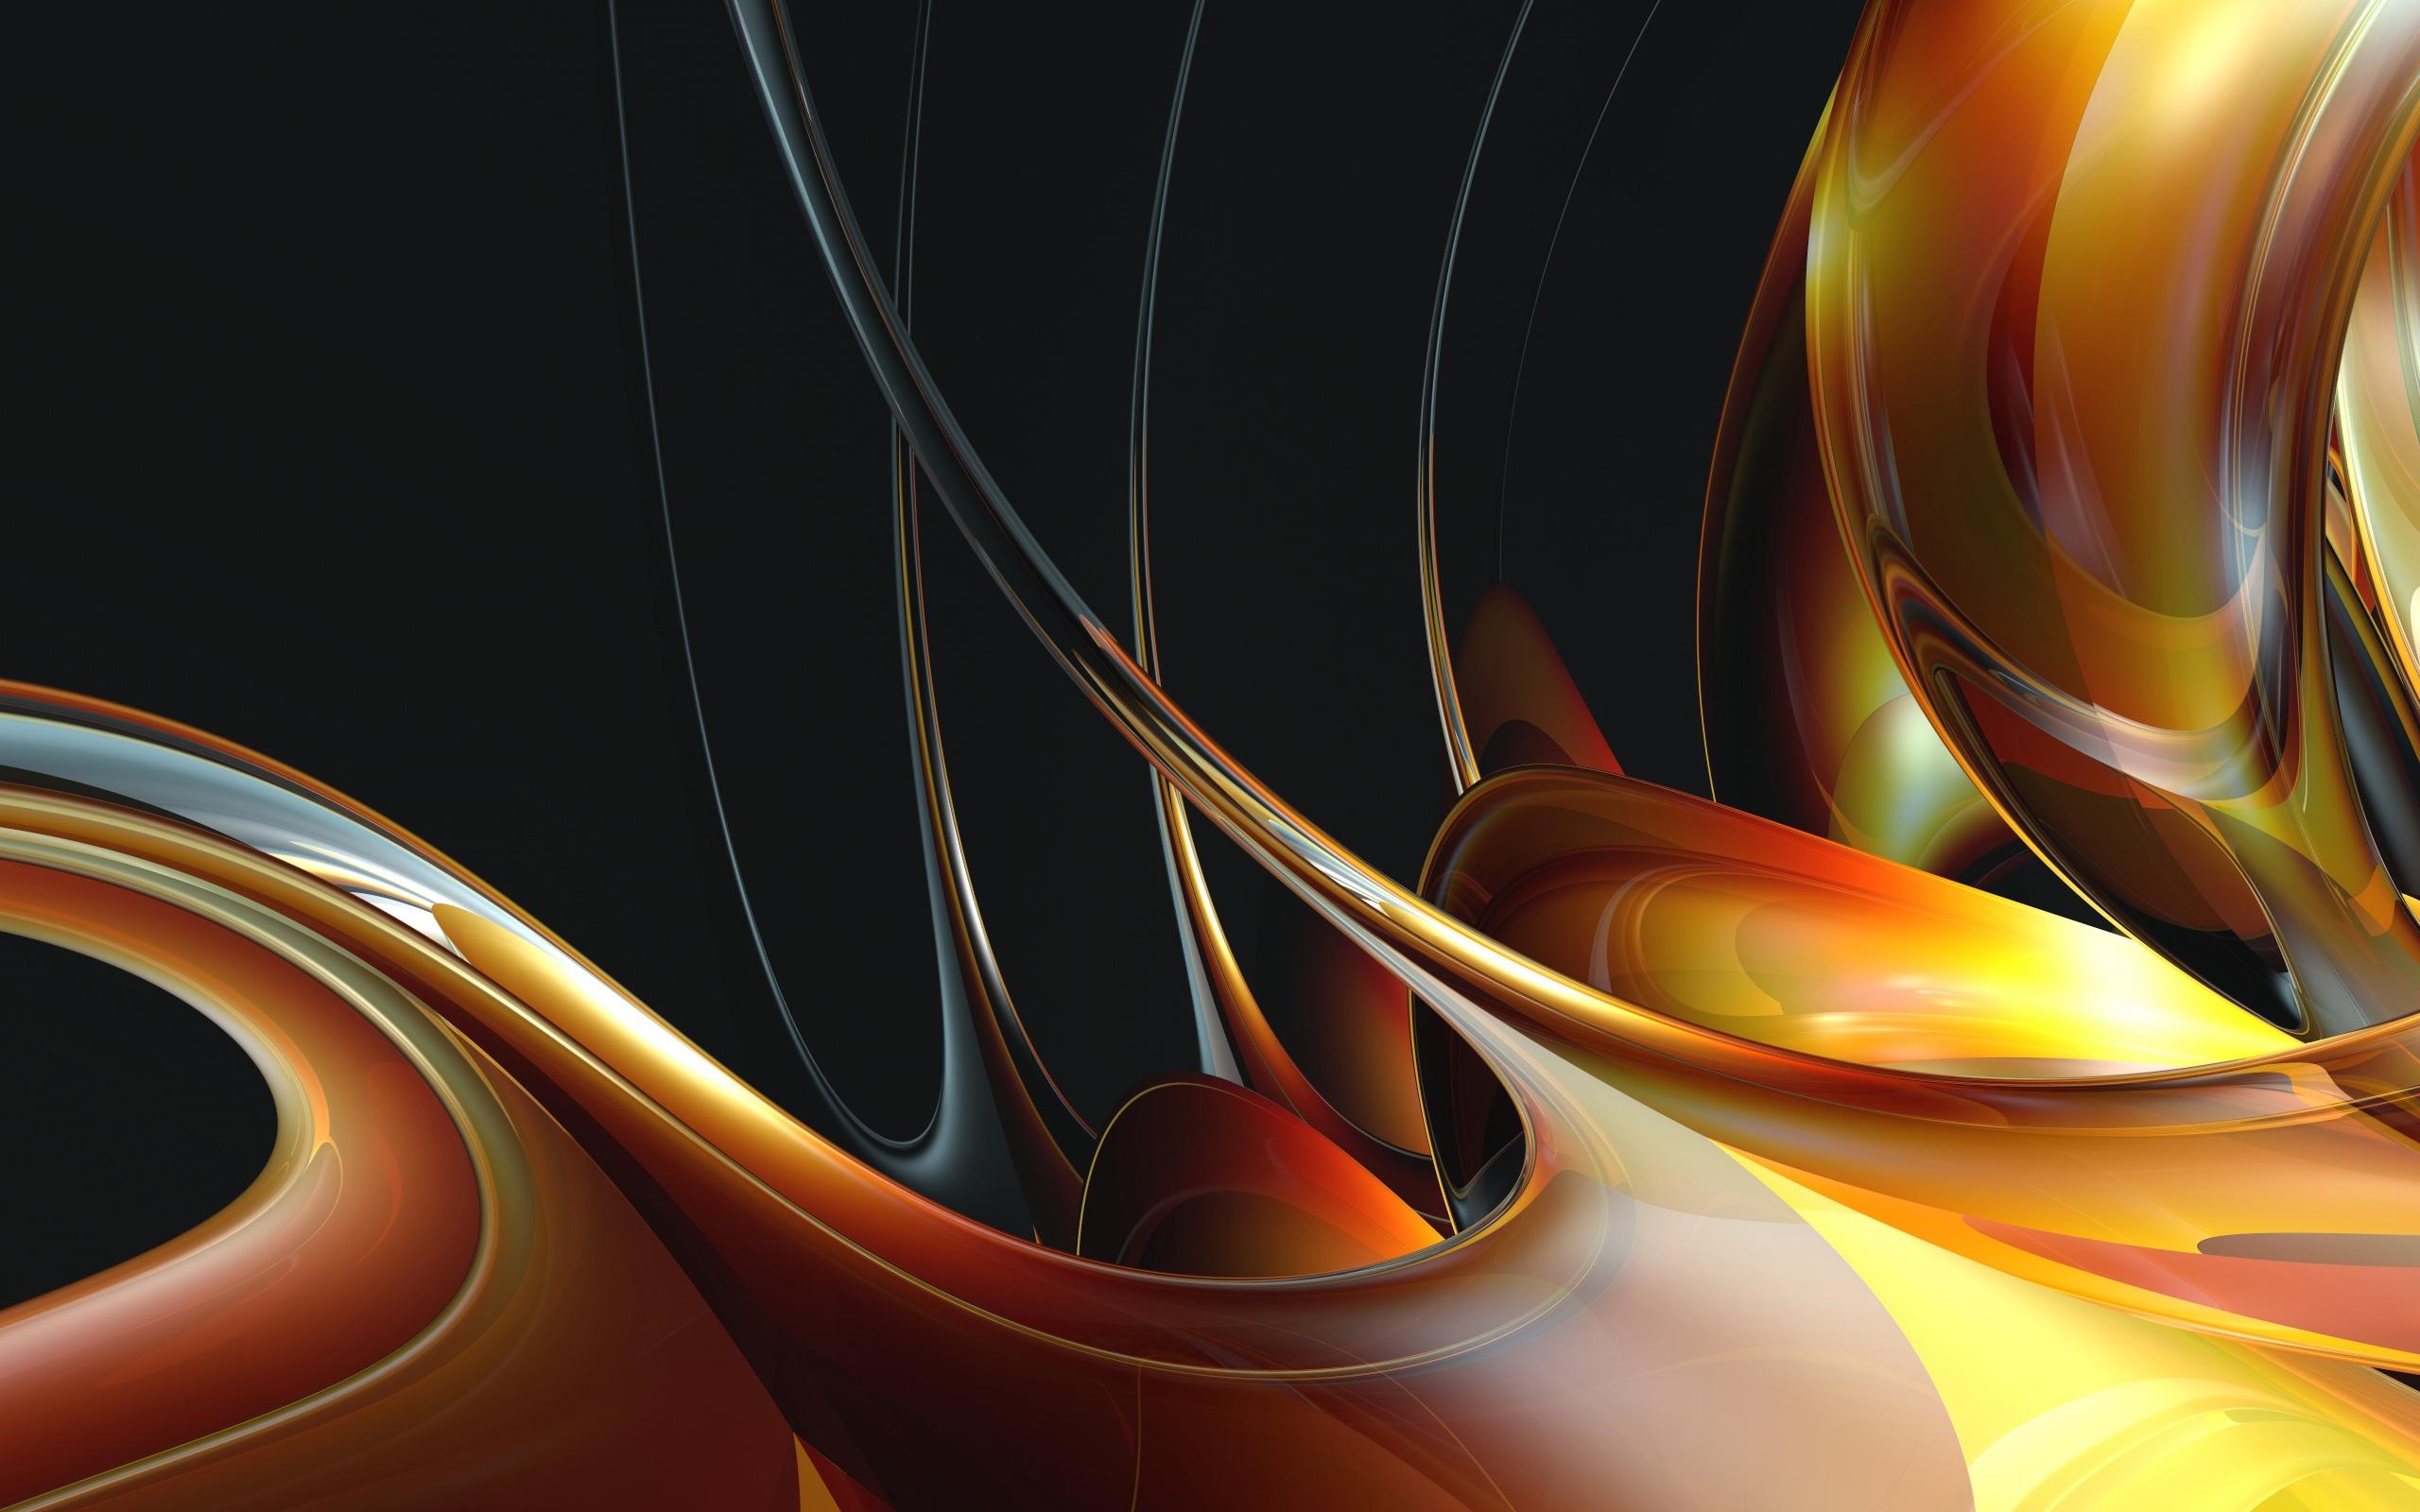 General 2560x1600 digital art abstract shapes render